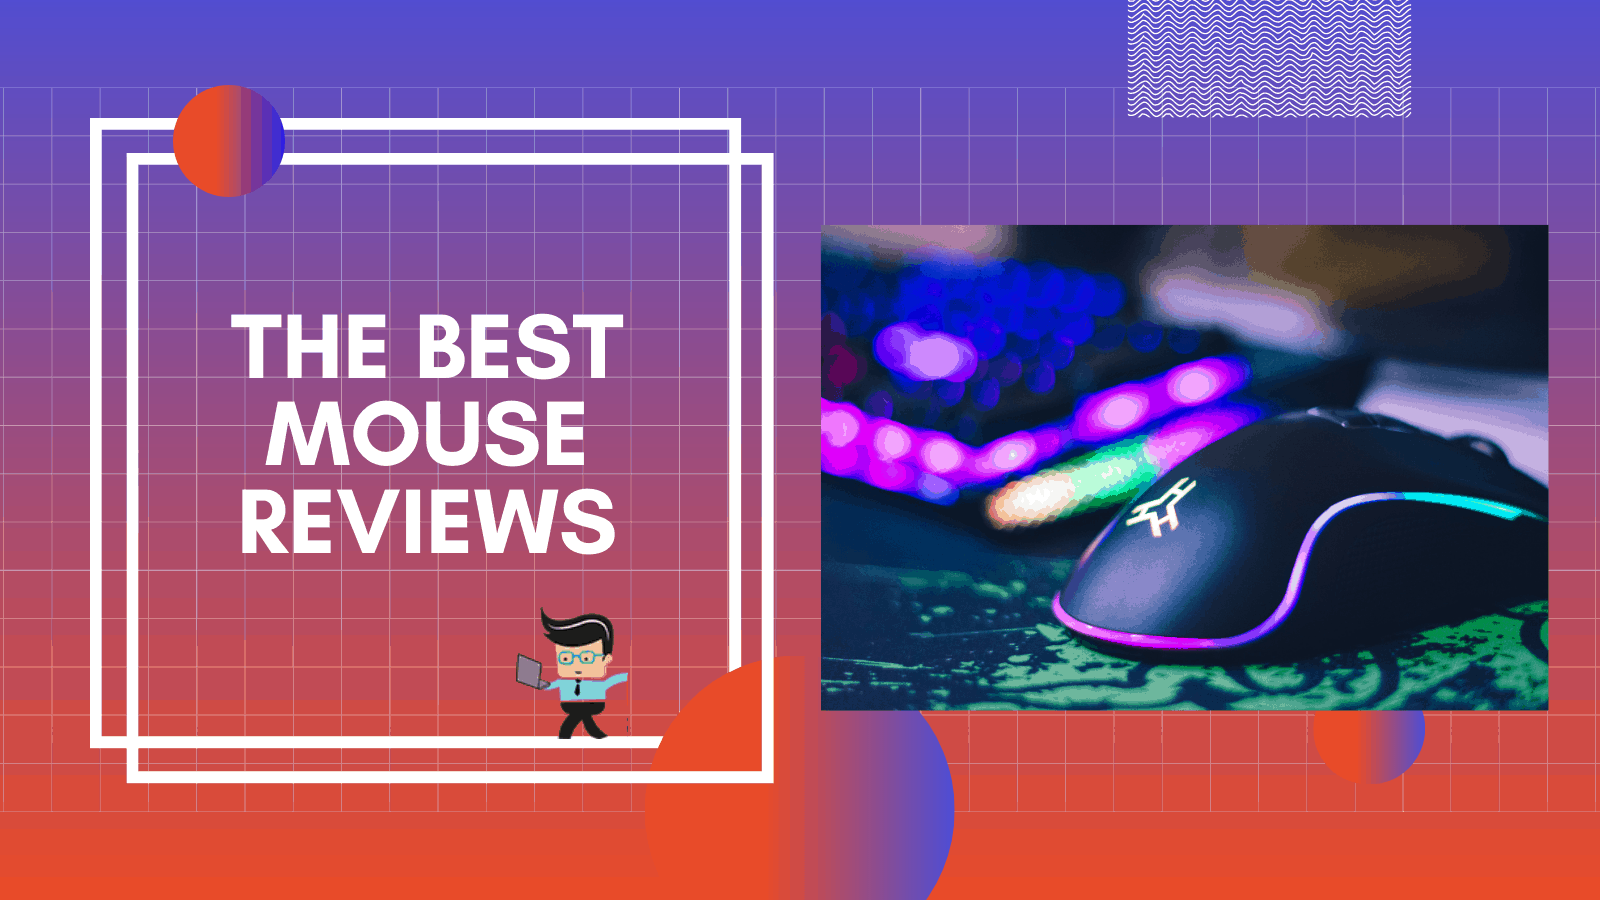 Mouse reviews